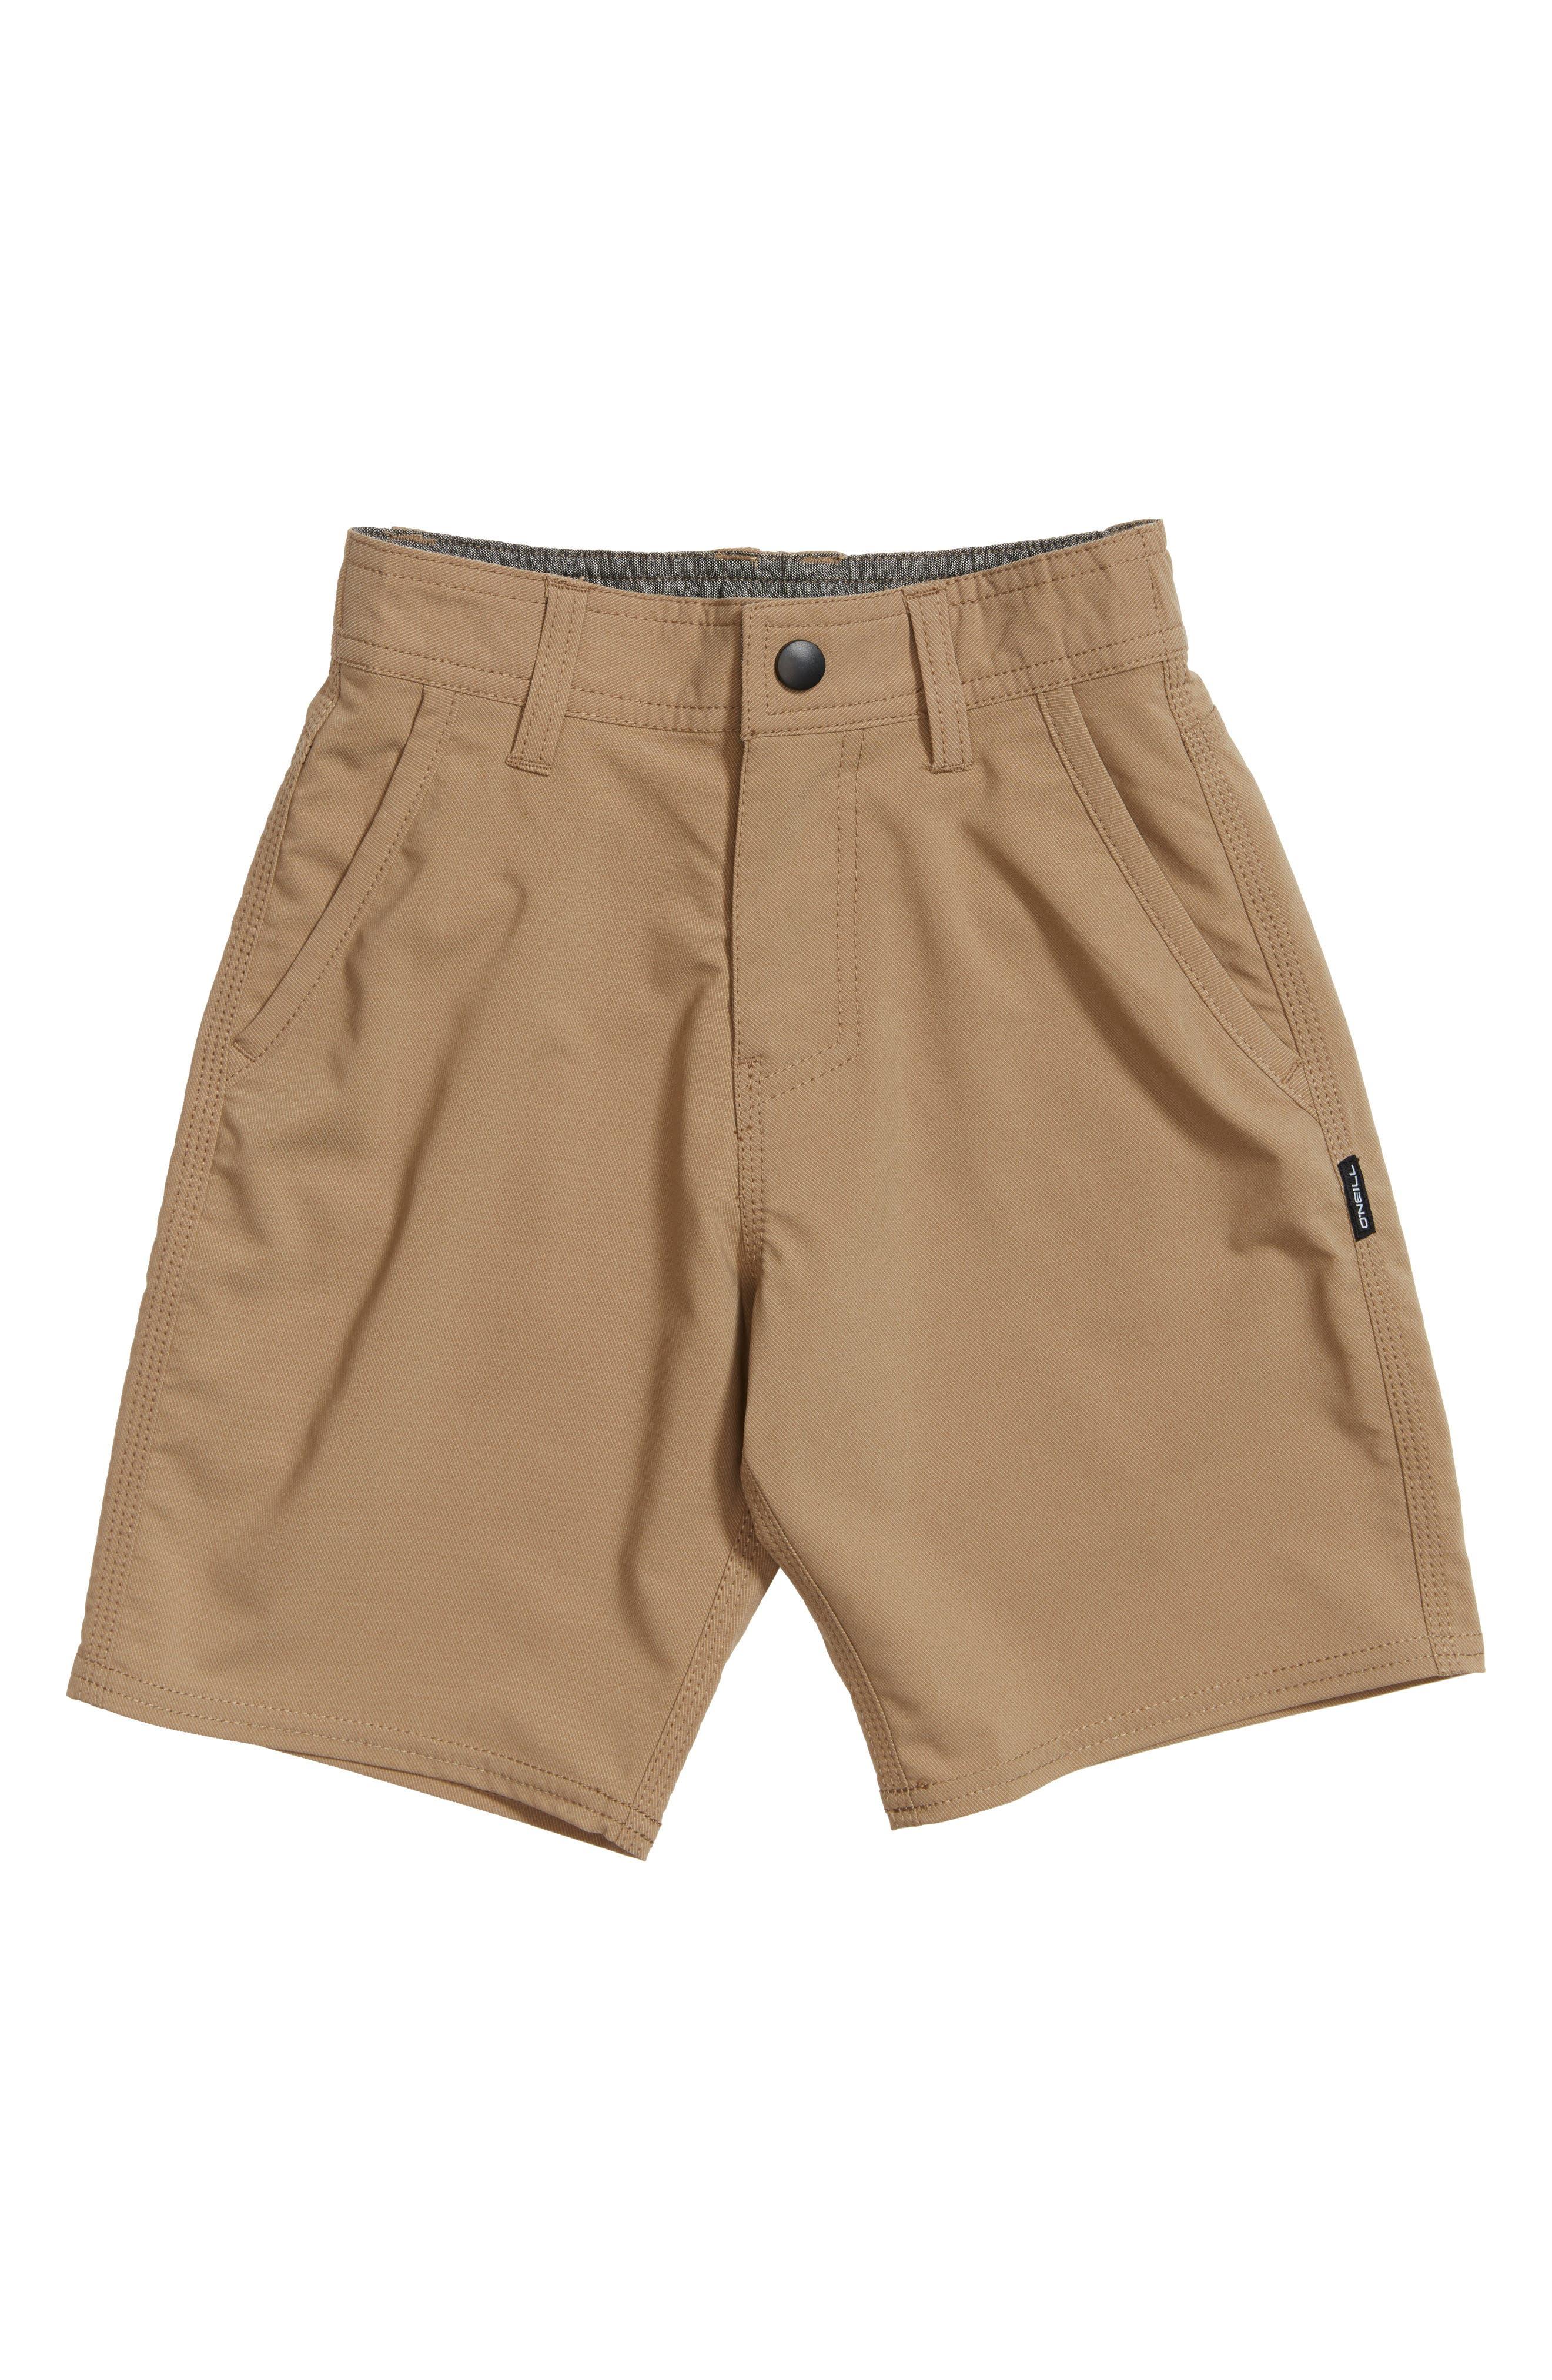 O'Neill Stockton Hybrid Shorts (Little Boys)